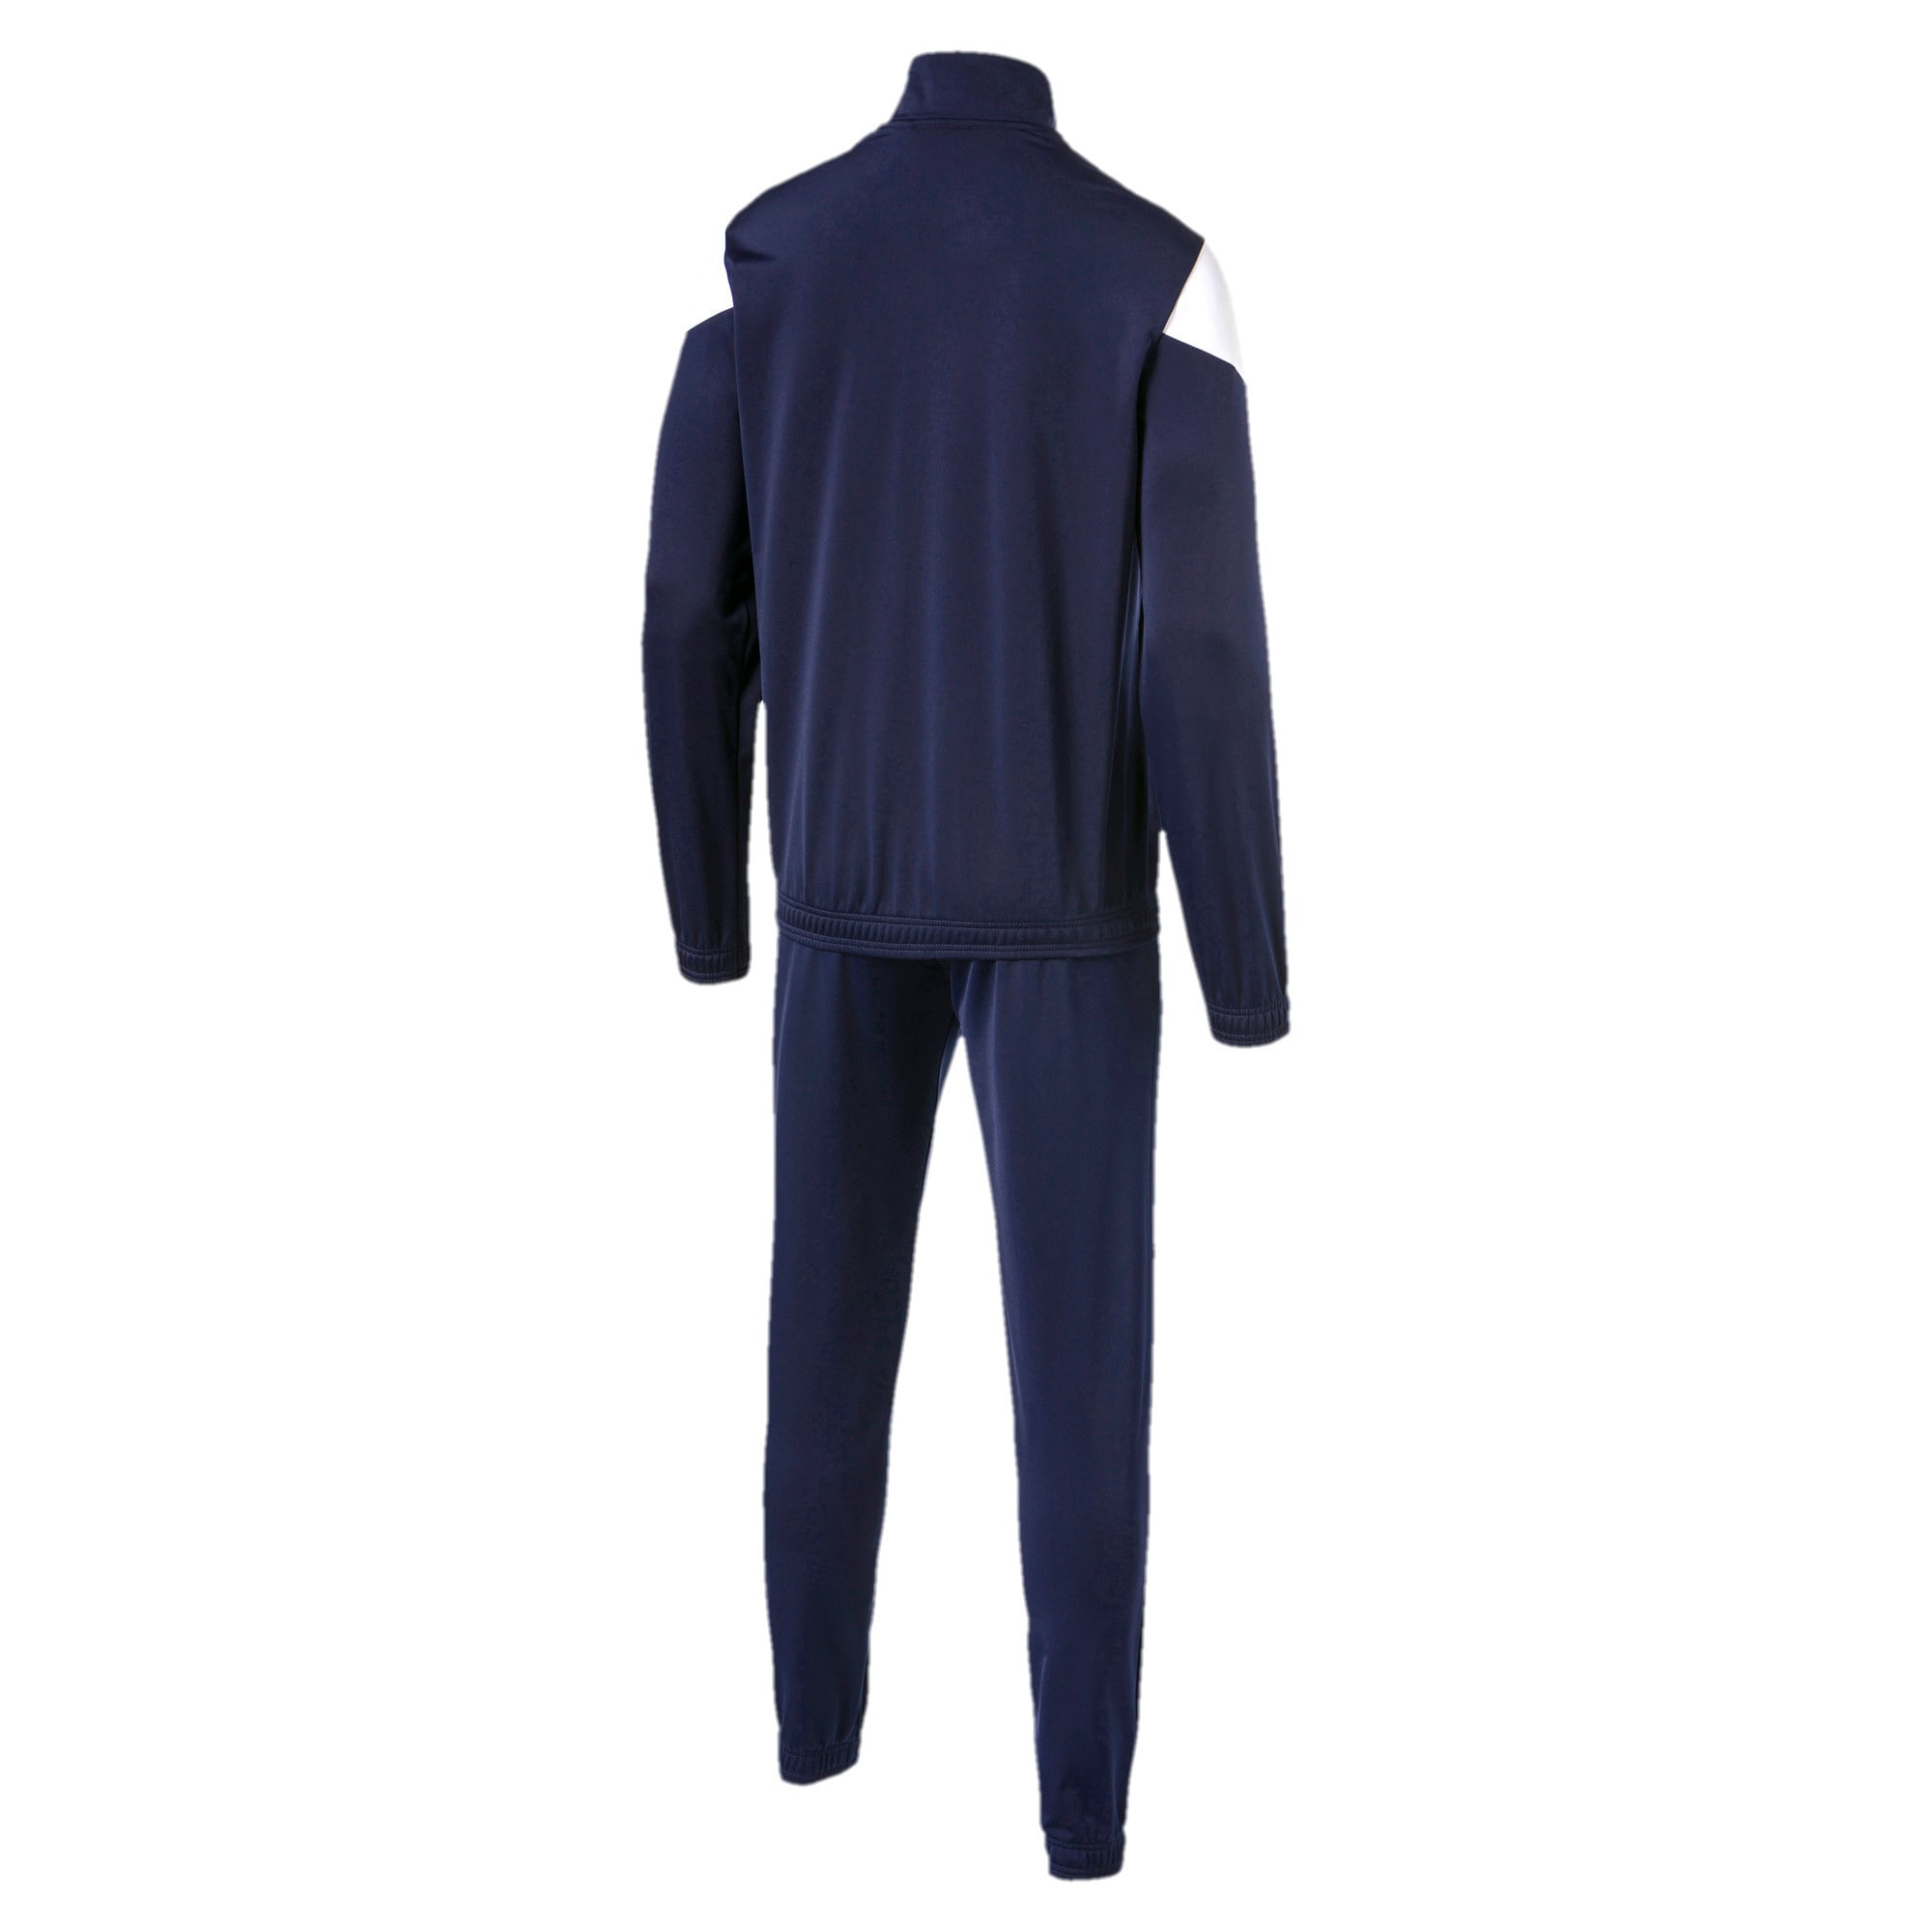 Thumbnail 5 of Clean Tricot Men's Track Suit, Peacoat, medium-IND